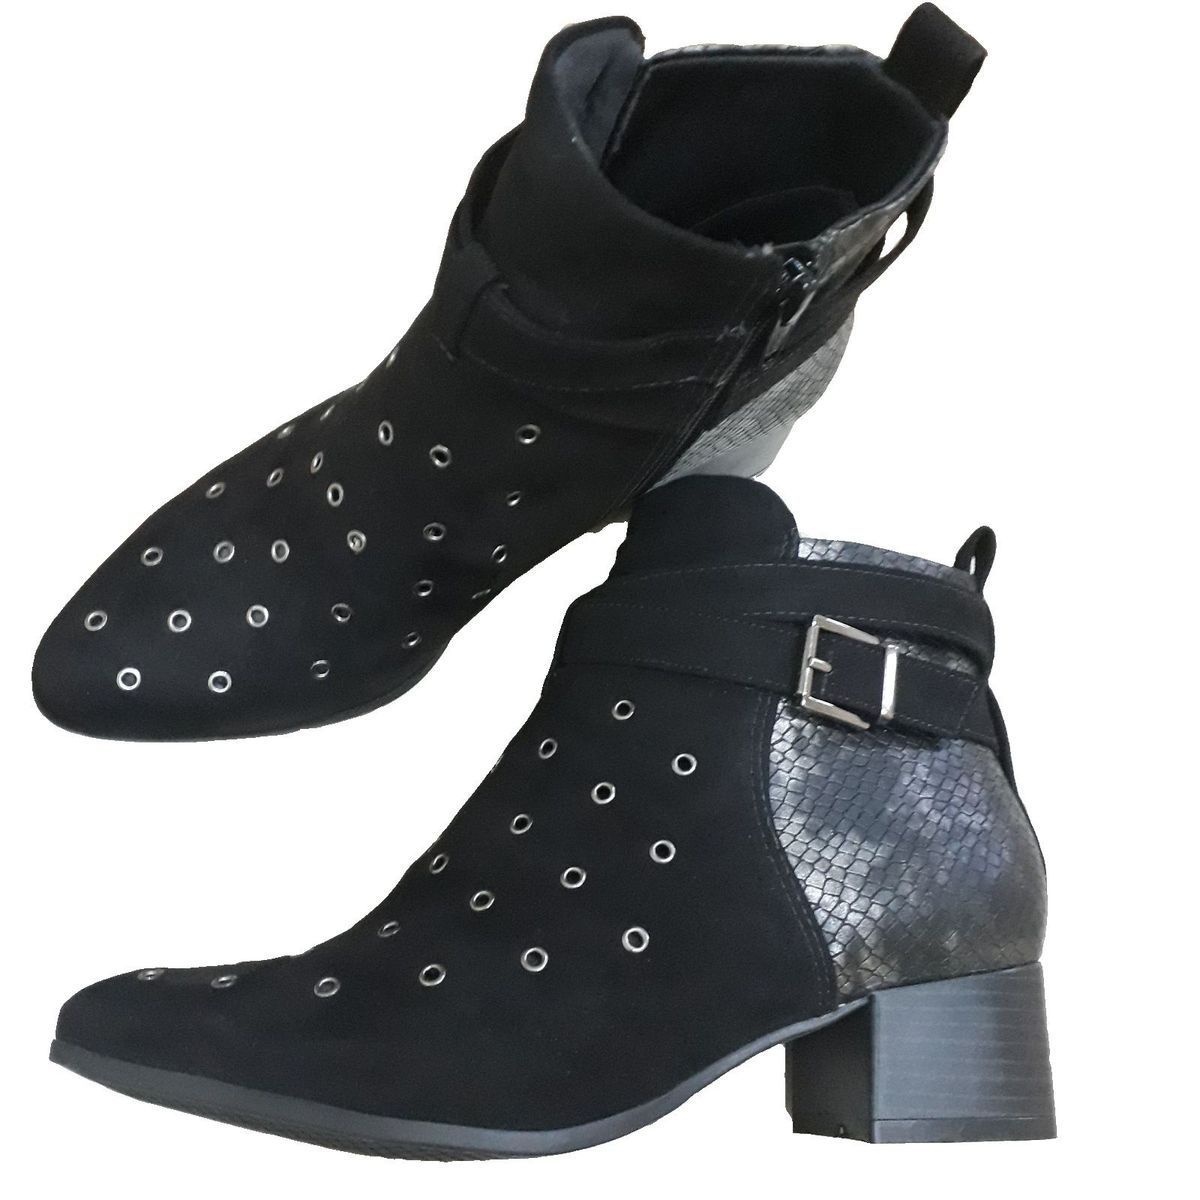 bota preta ramarim - botas ramarim